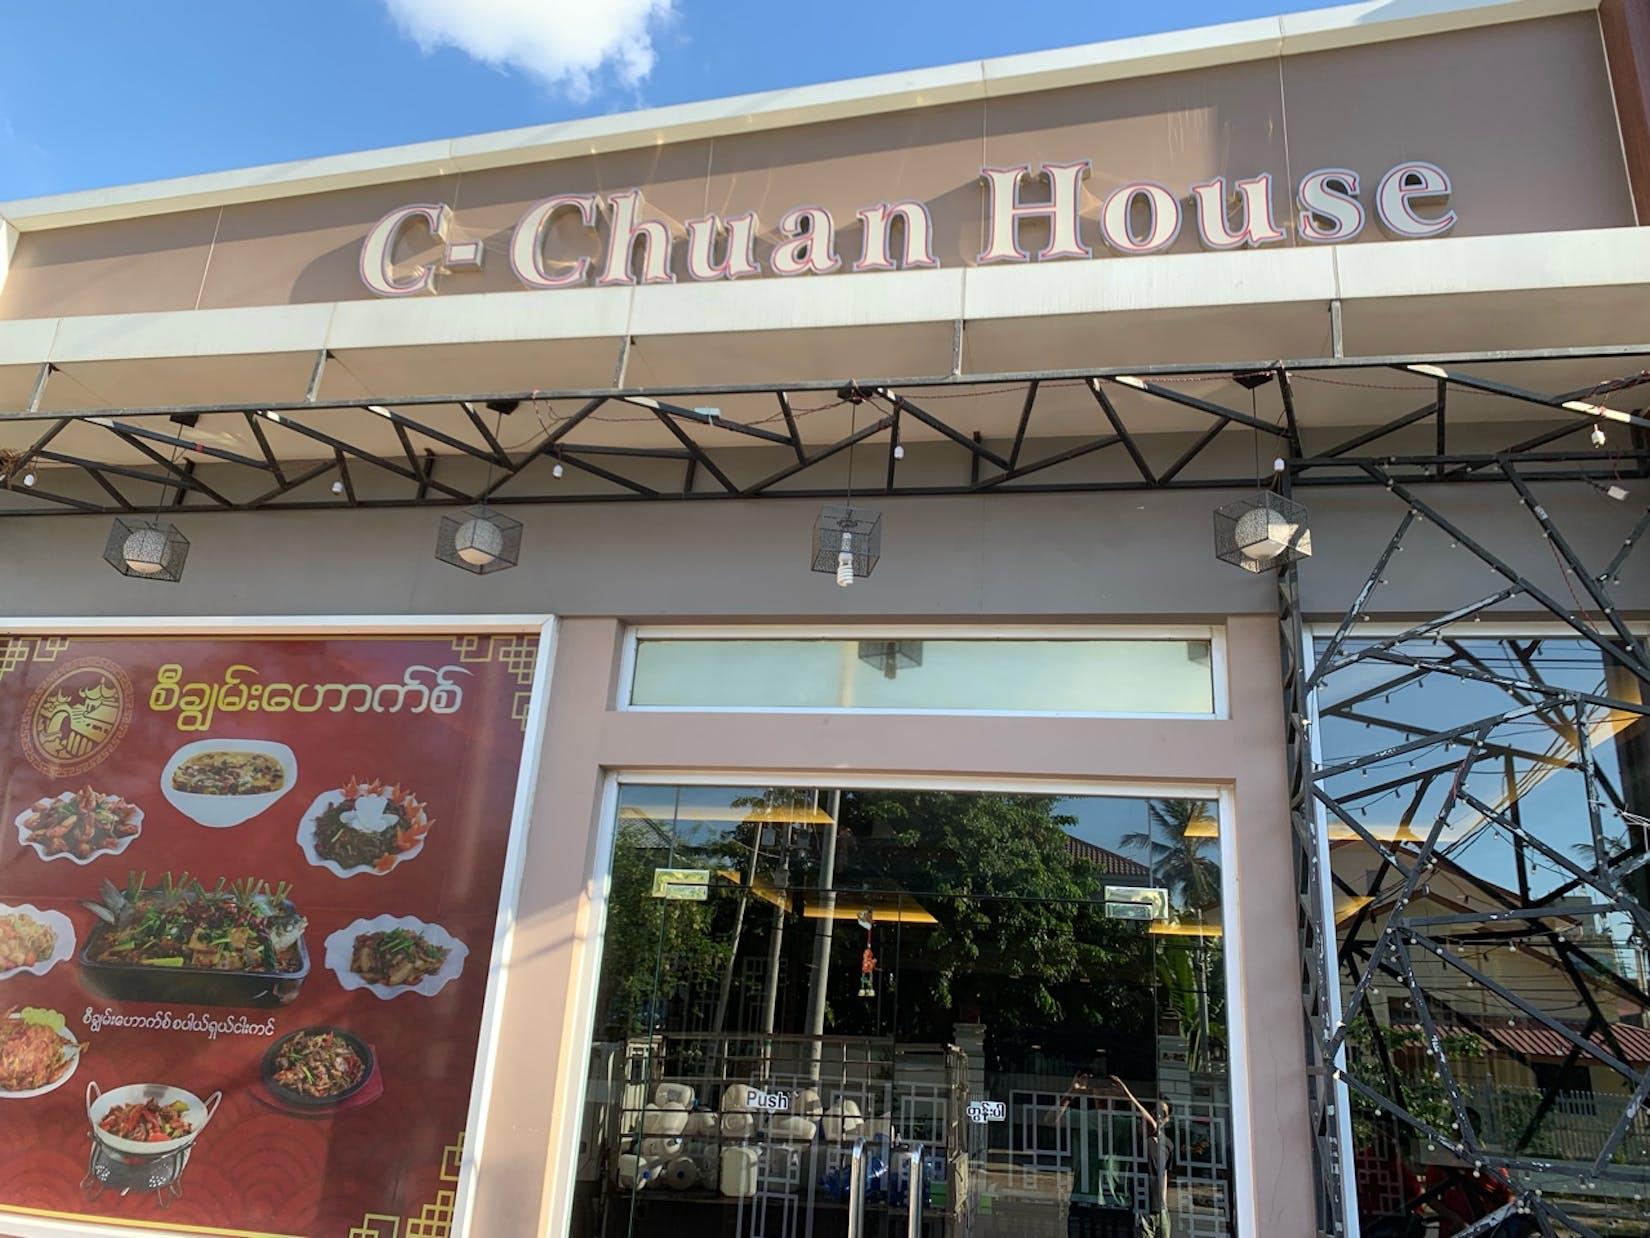 C-Chuan House Restaurant | yathar